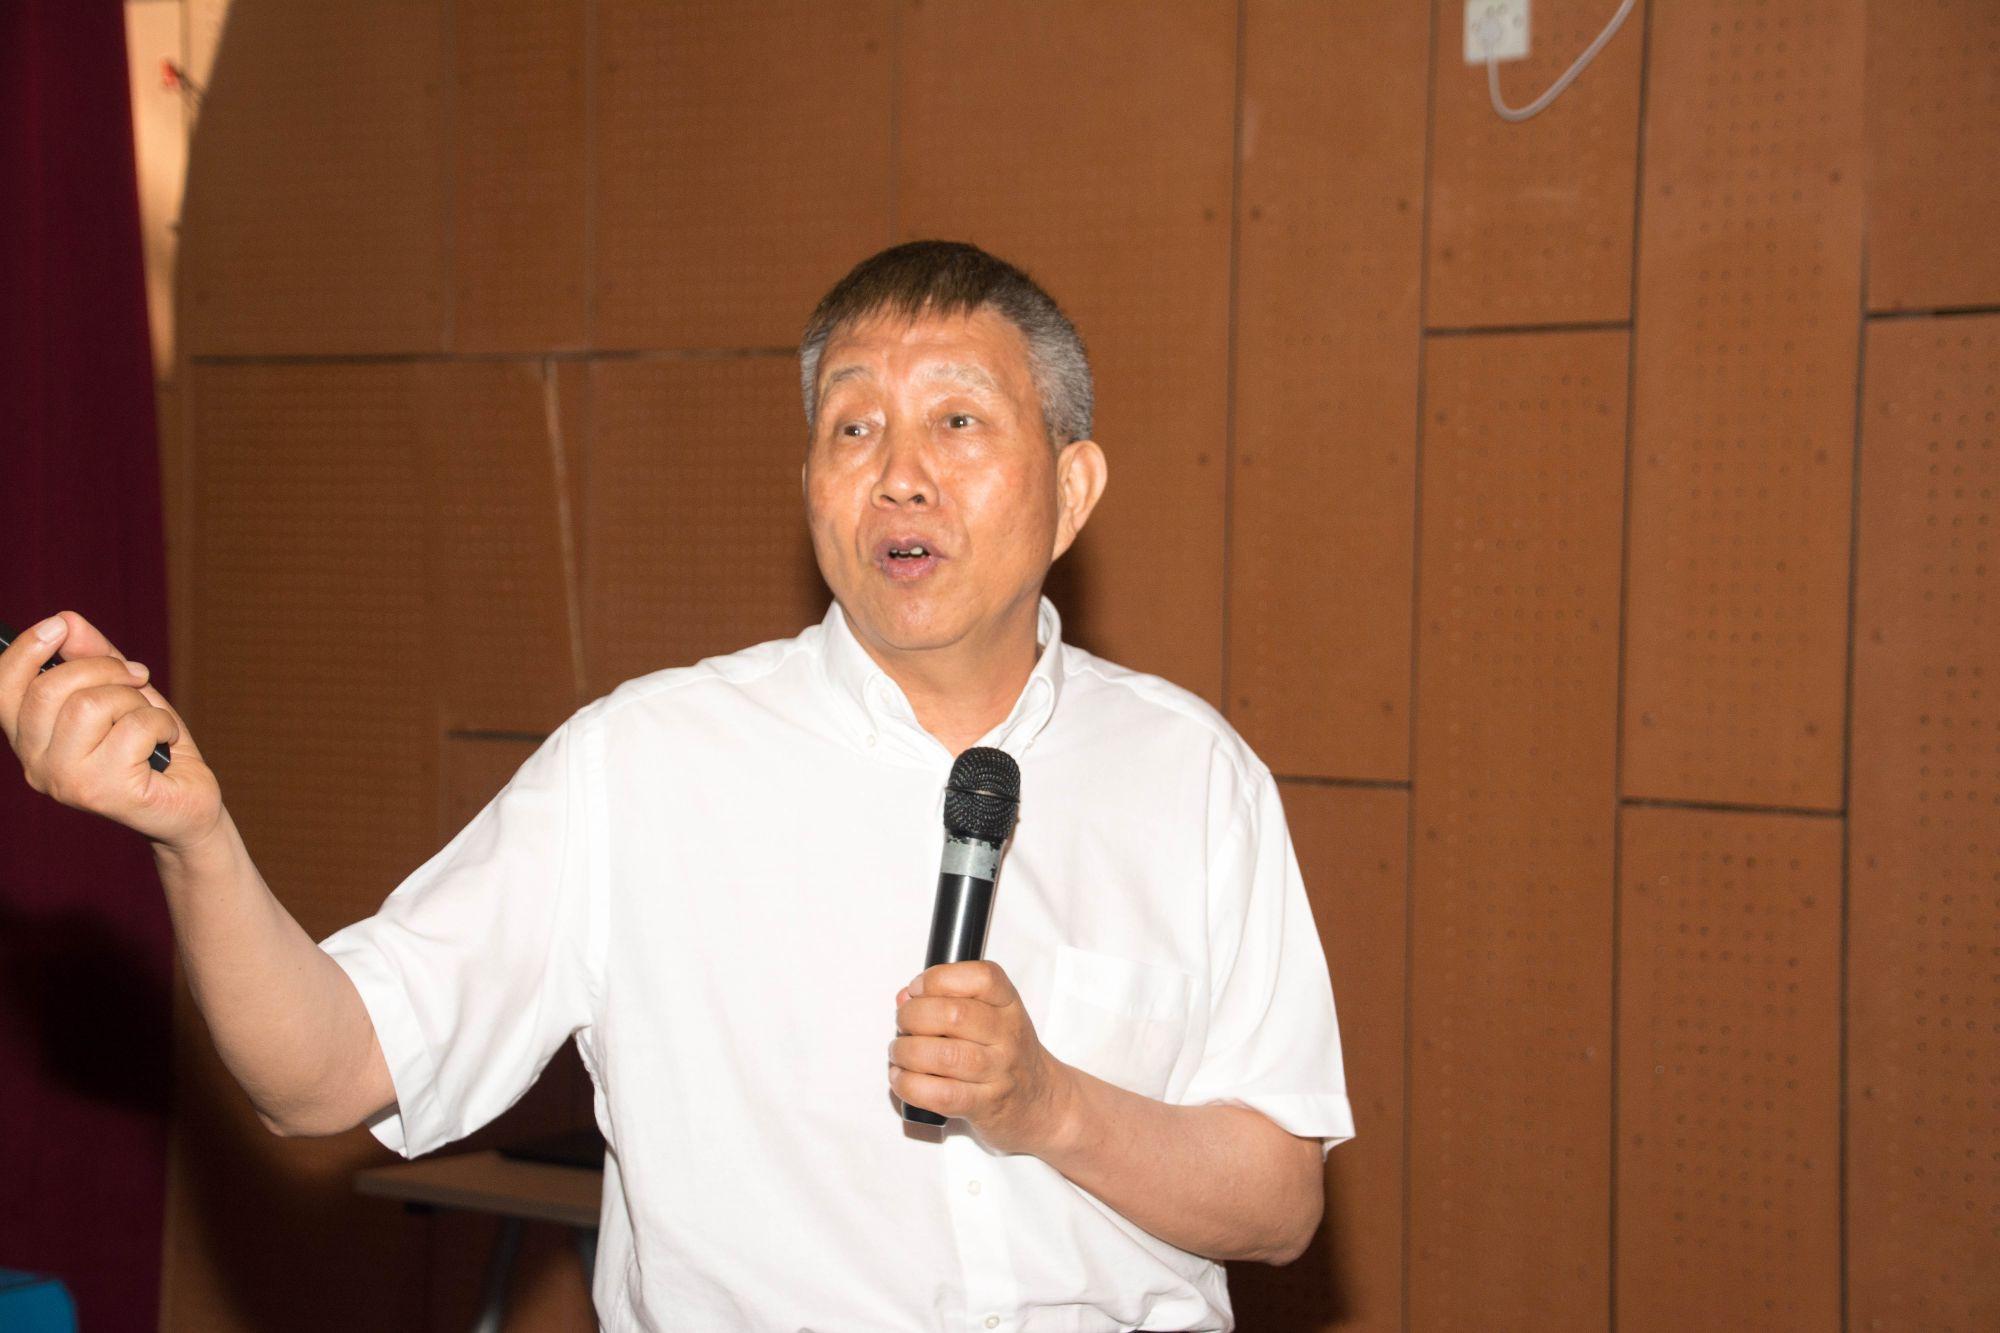 CAS Fellow Zhang Tongyi Lectures on Materials Informatics